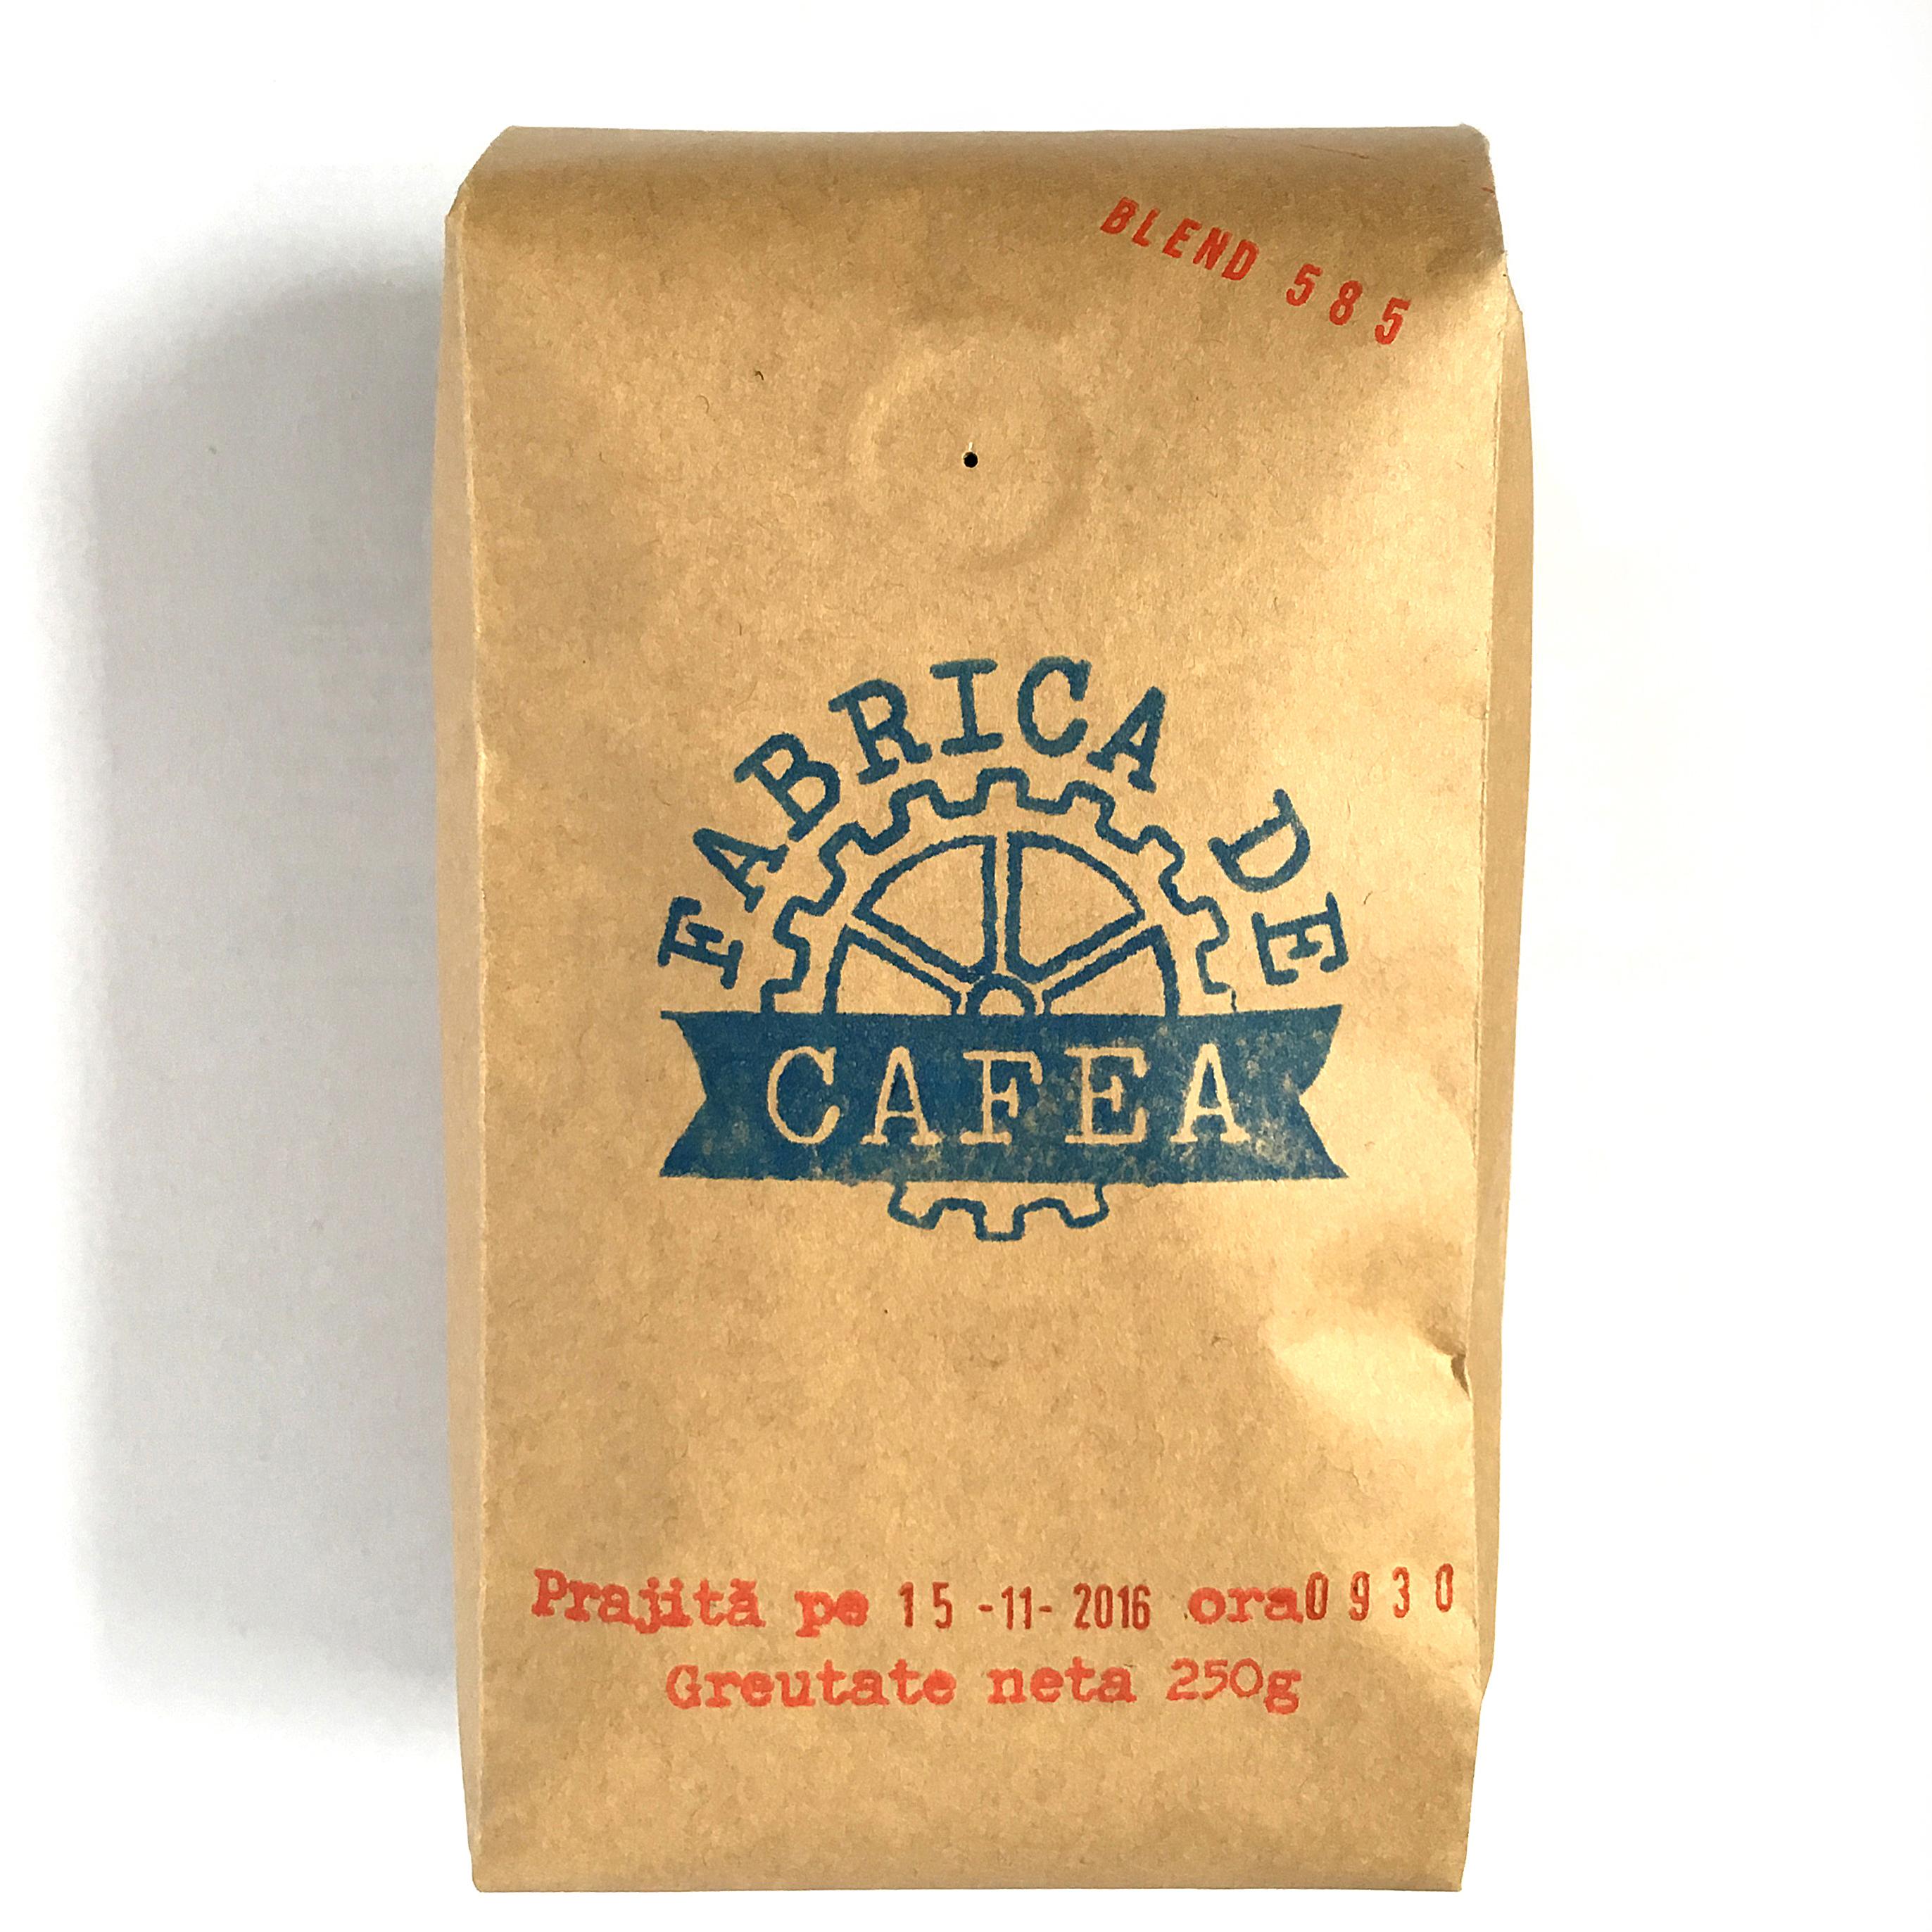 Cafea Blend 585  250g